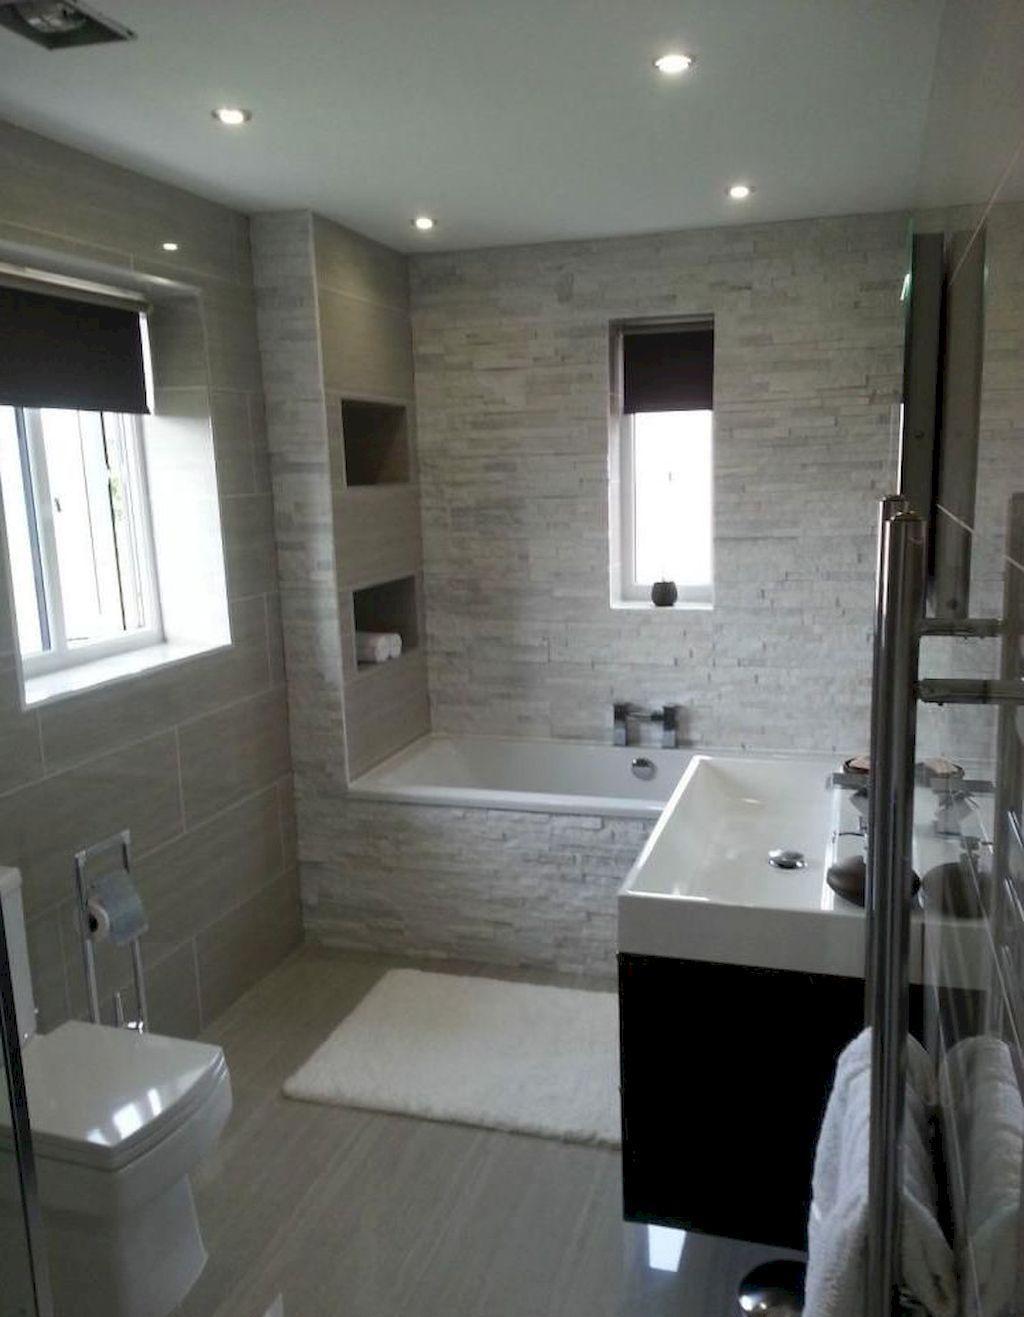 I Want To Remodel My Bathroom Bathroom Design Small Gray